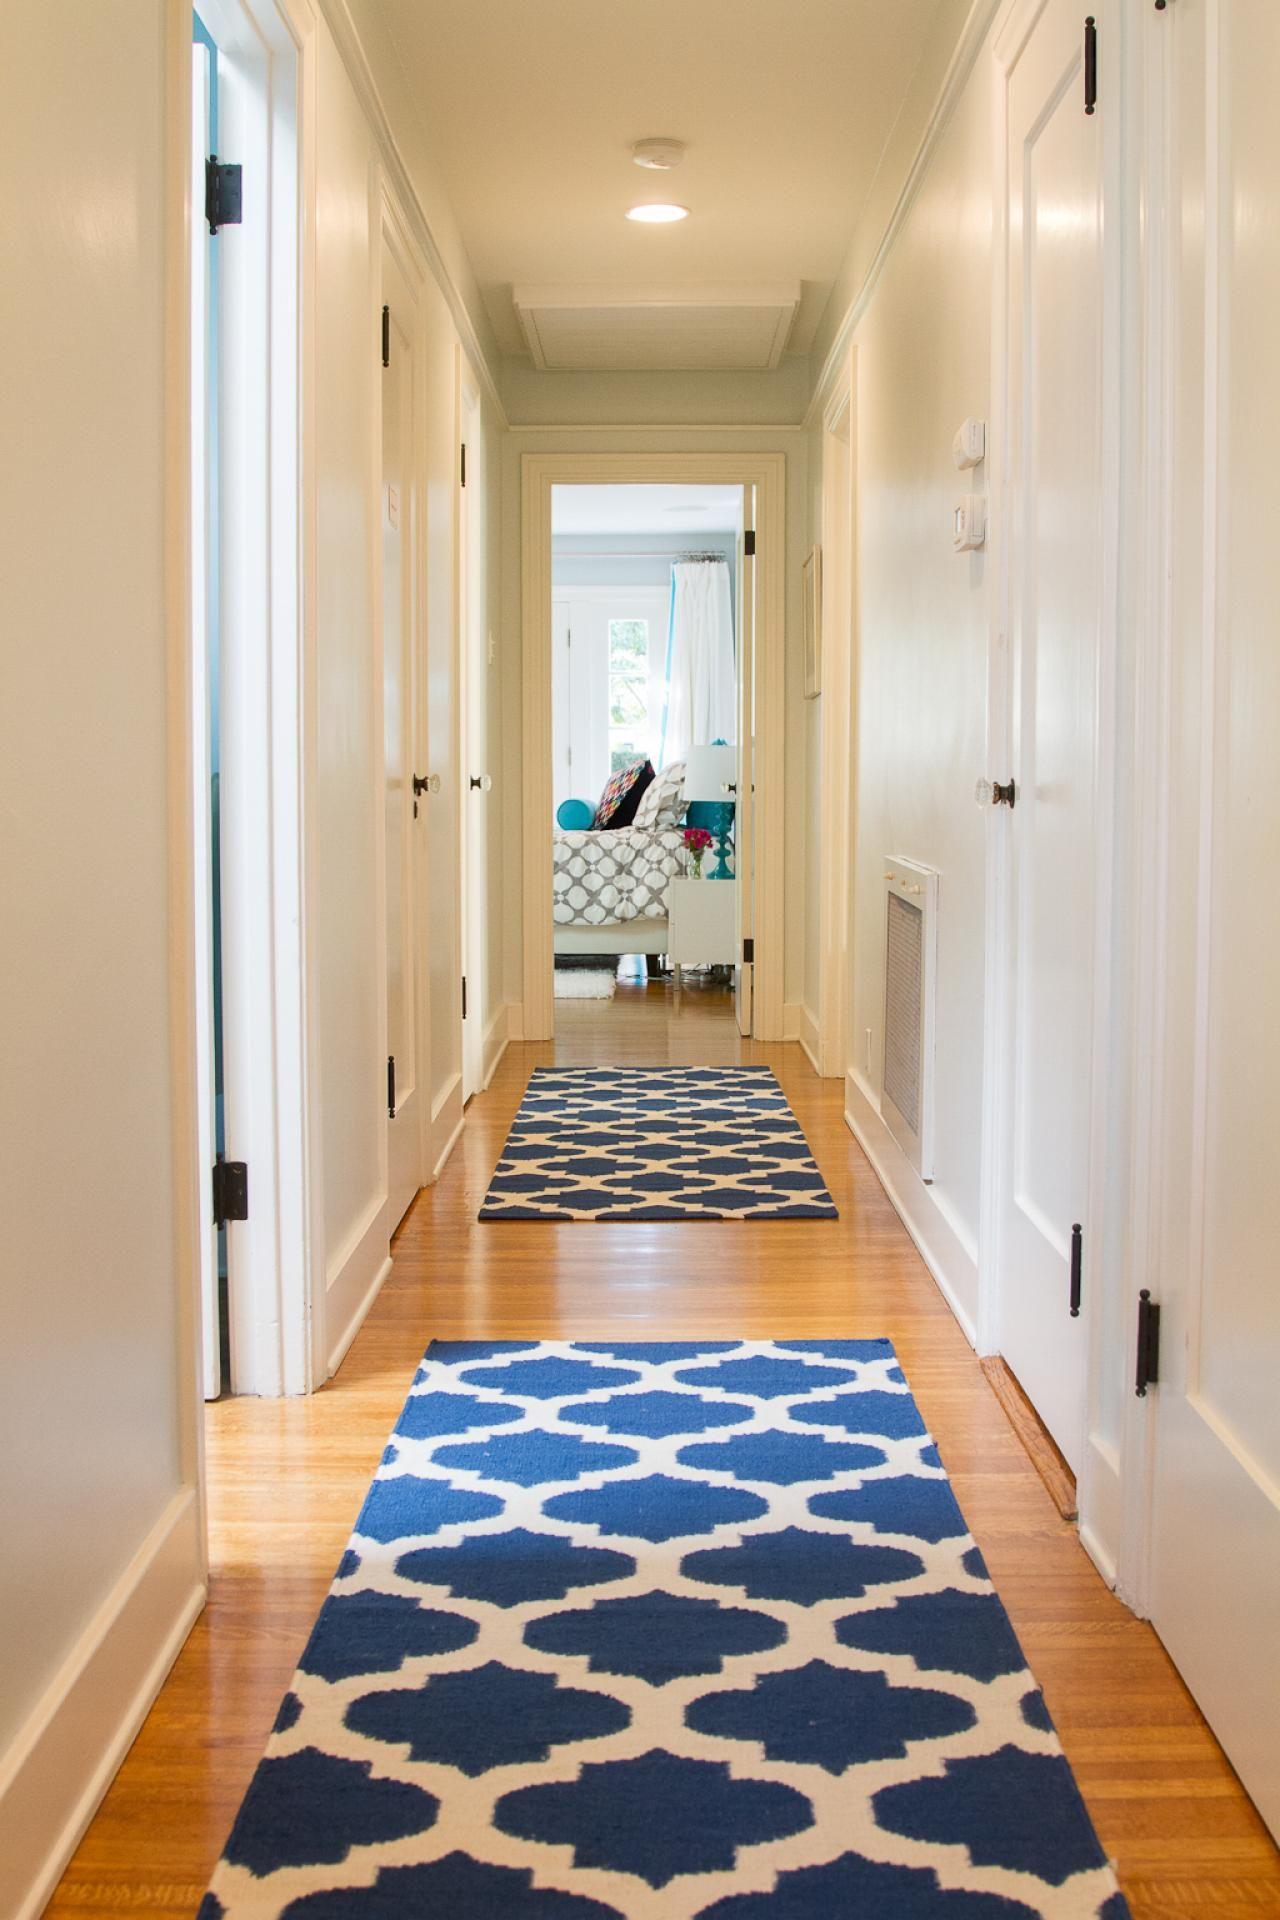 1st Floor Hallway Our Home Hallway Decorating Hallway